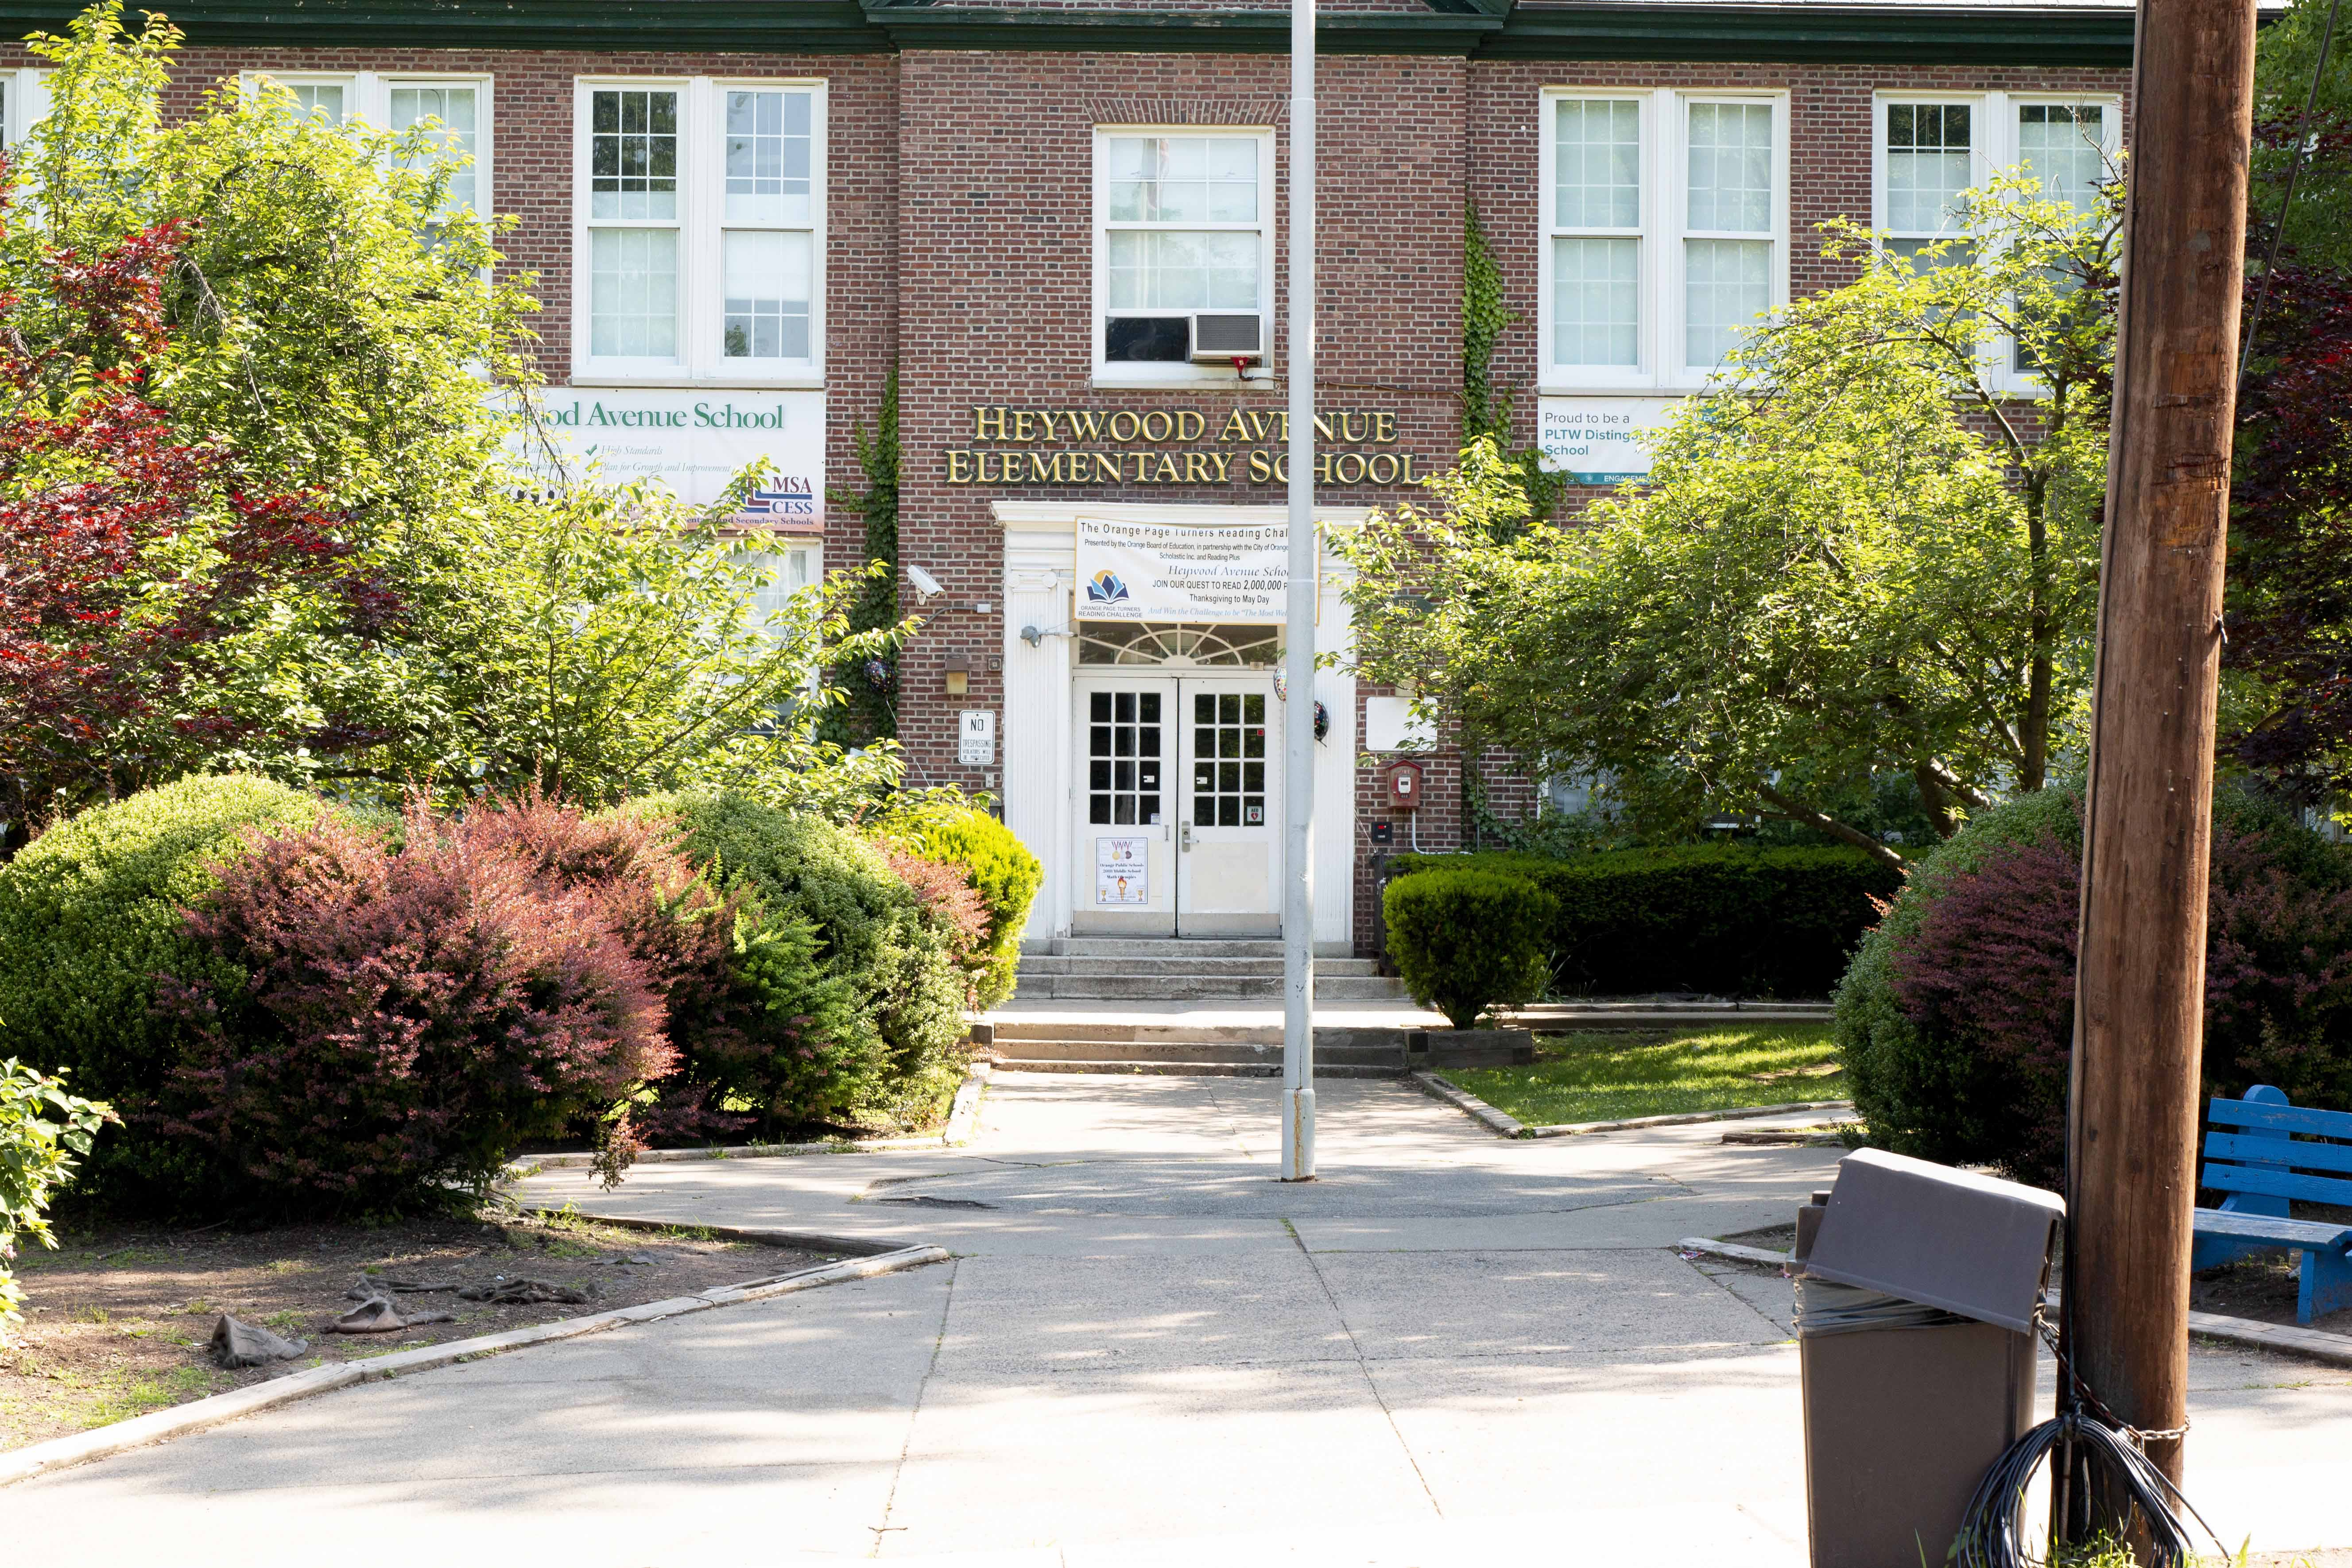 L-Train Memorial - #SupportASon (Heywood Avenue Elementary School, Orange NJ) 06-09-18_0001